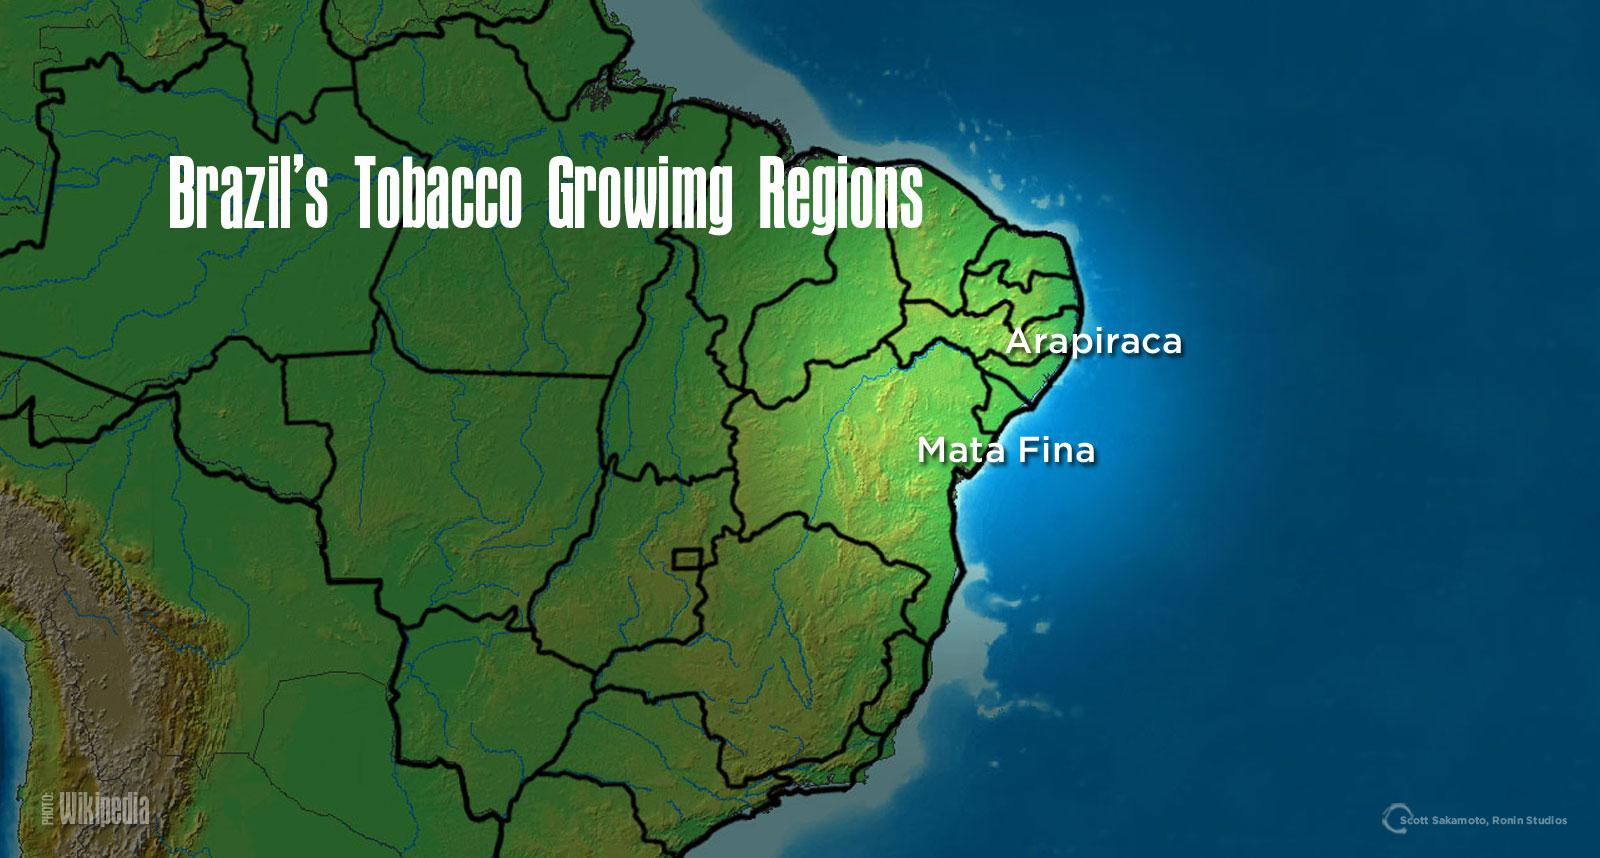 Brazilian Arapiraca Wrappers, Mata Fina, Tobacco Regions, Brazilian Tobacco Tobaccos